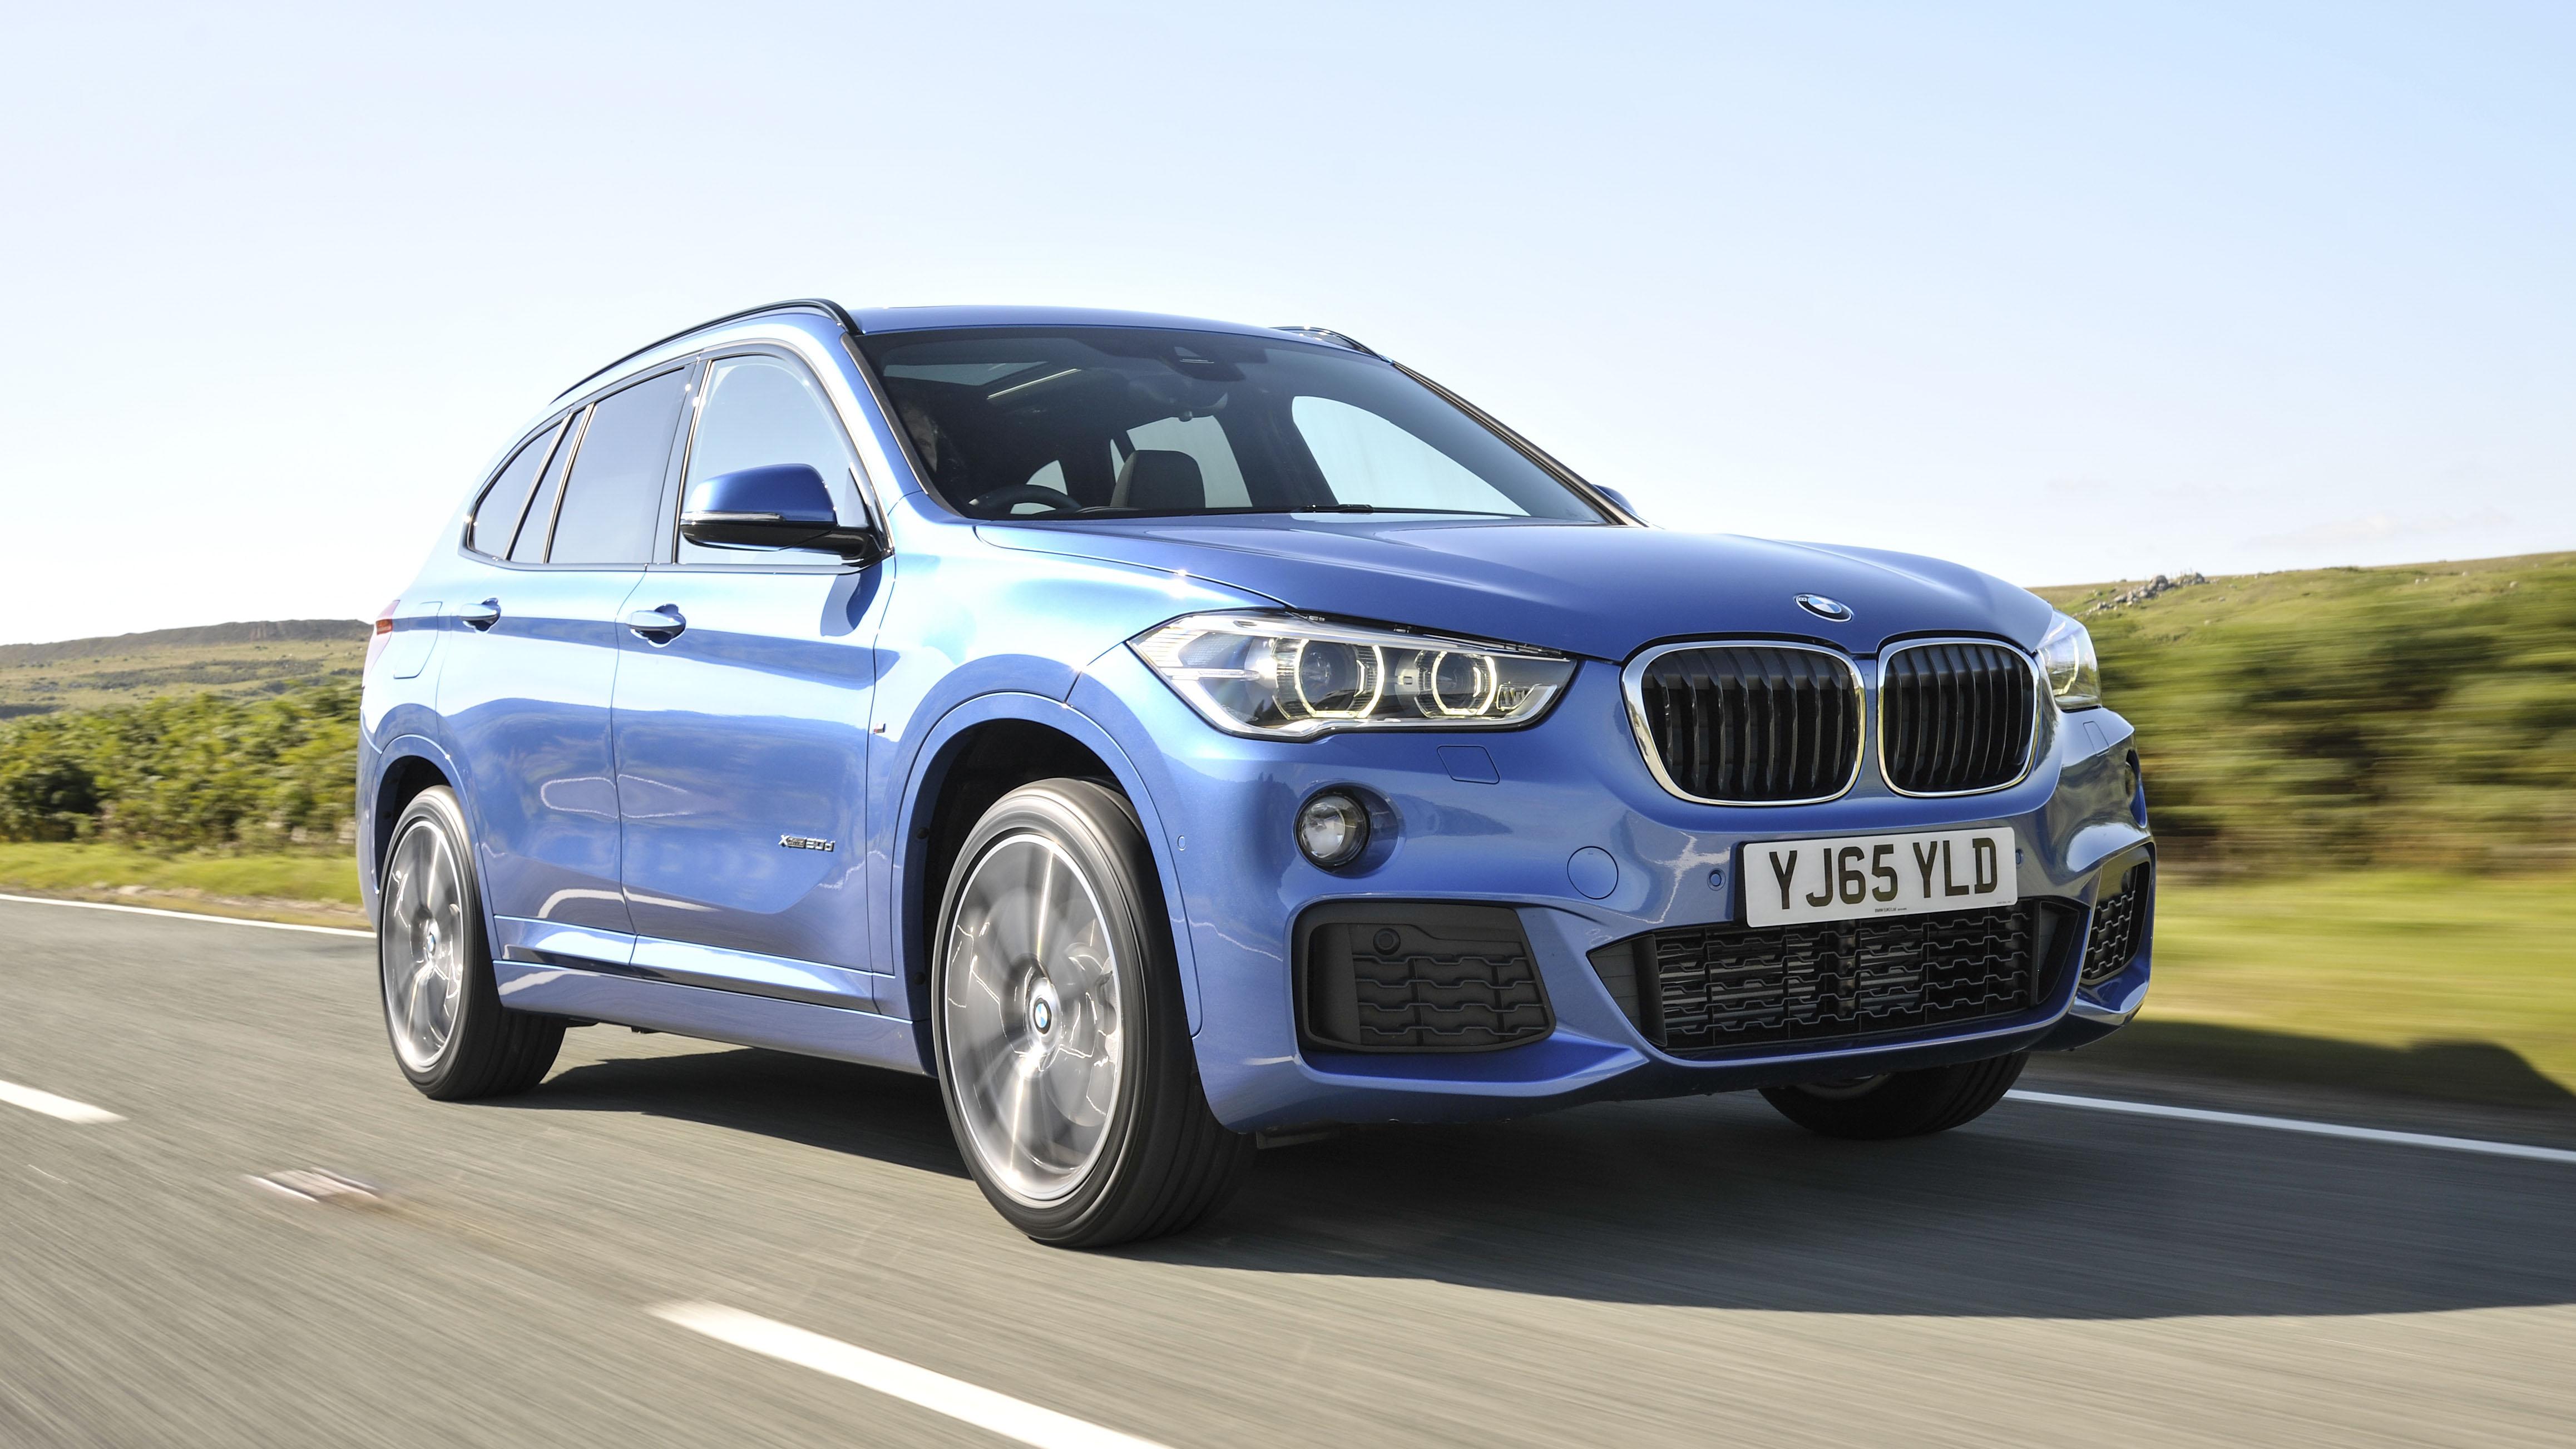 BMW X1 Xdrive 20d front quarter